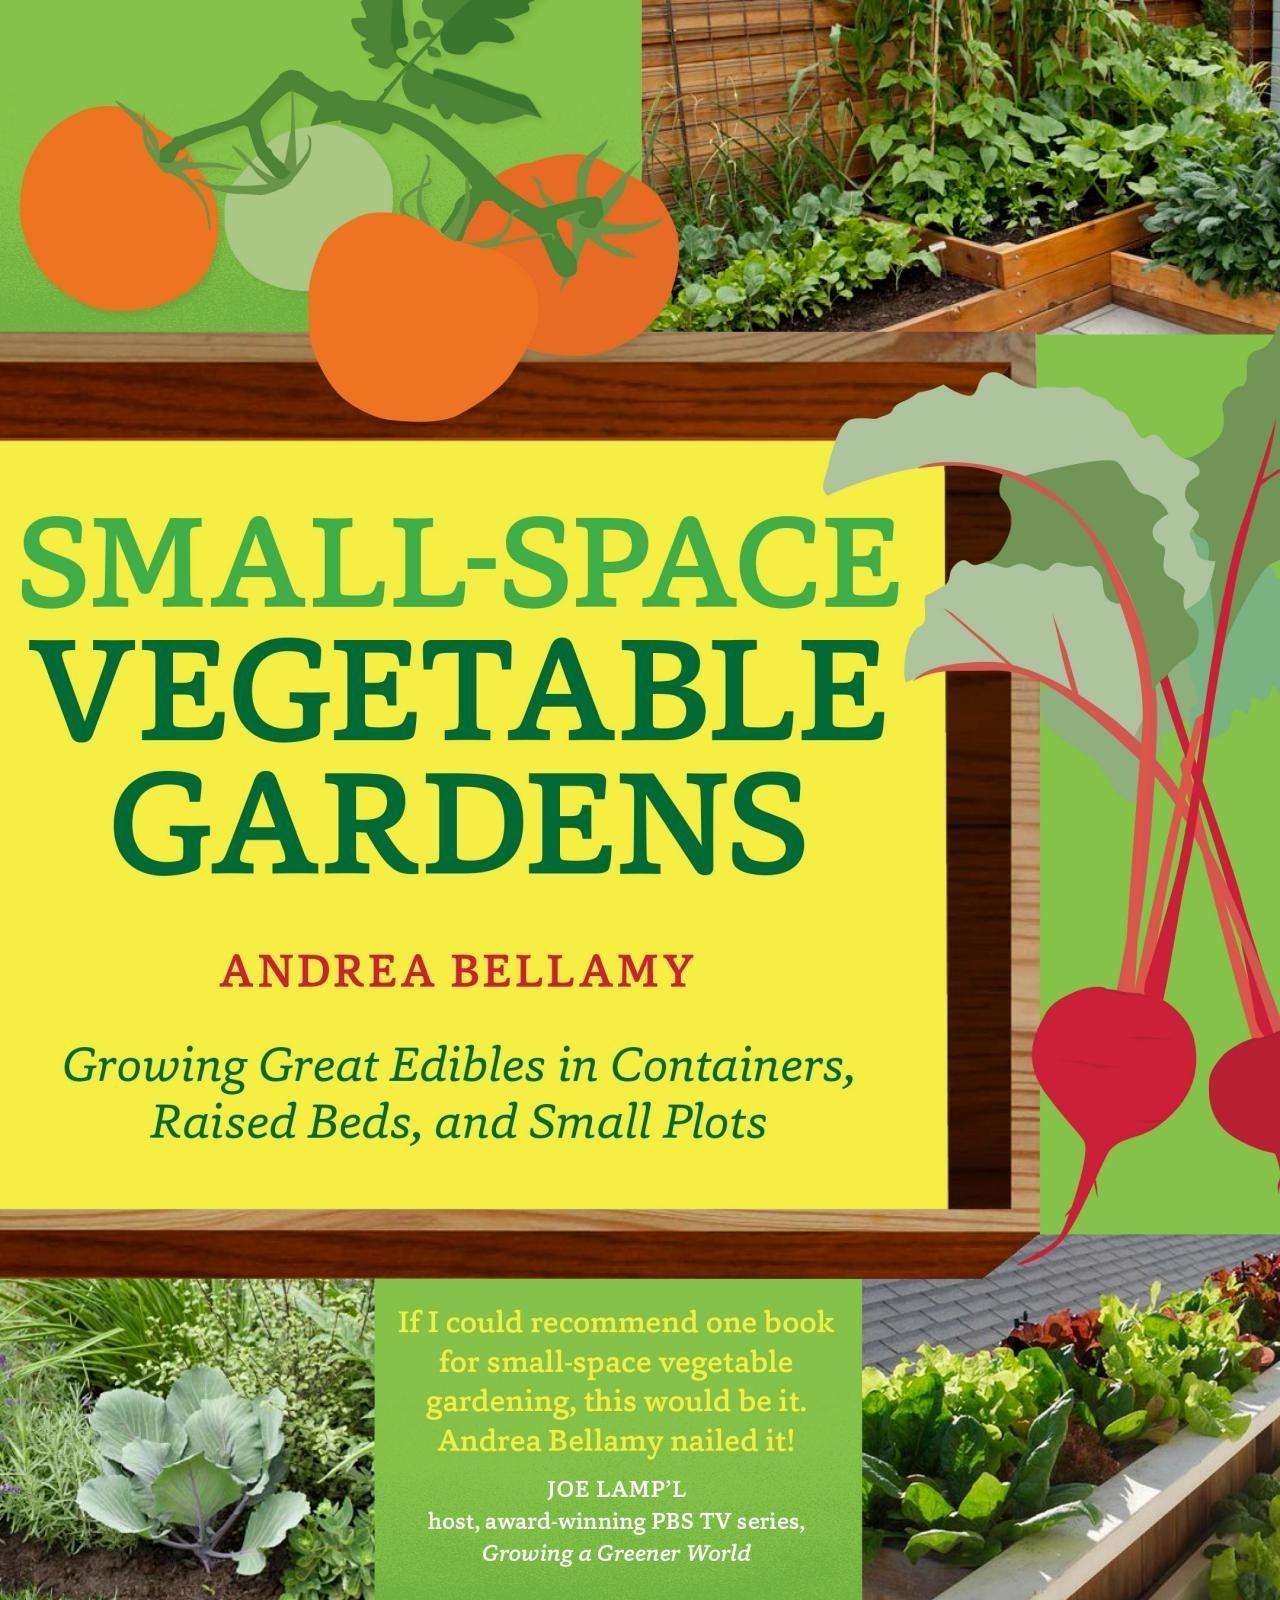 10 Pretty Vegetable Garden Ideas For Small Spaces %name 2020